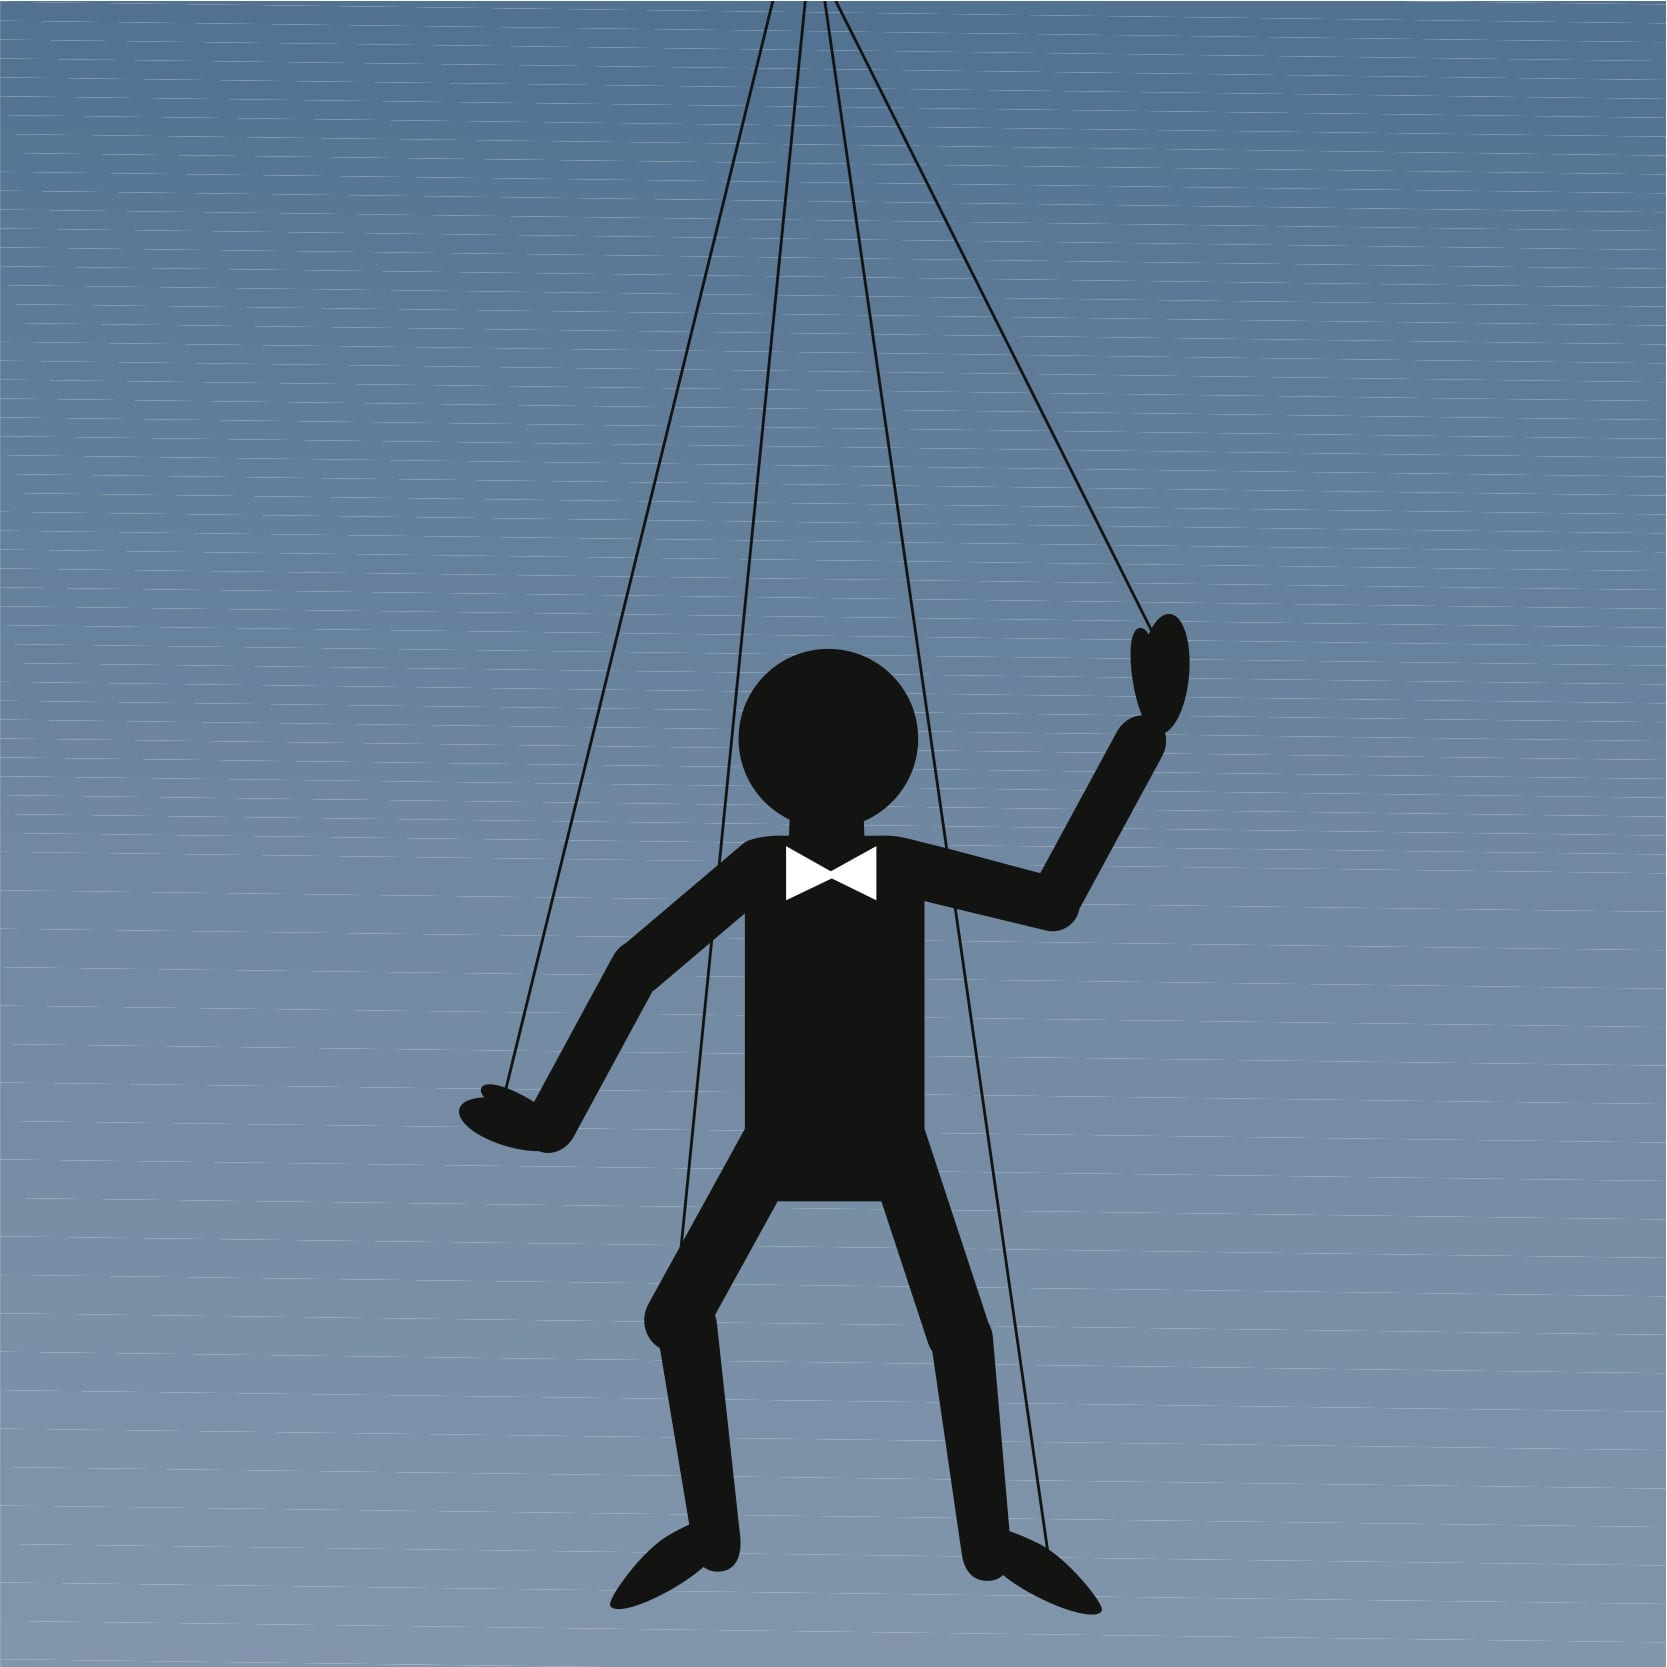 stick figure on strings